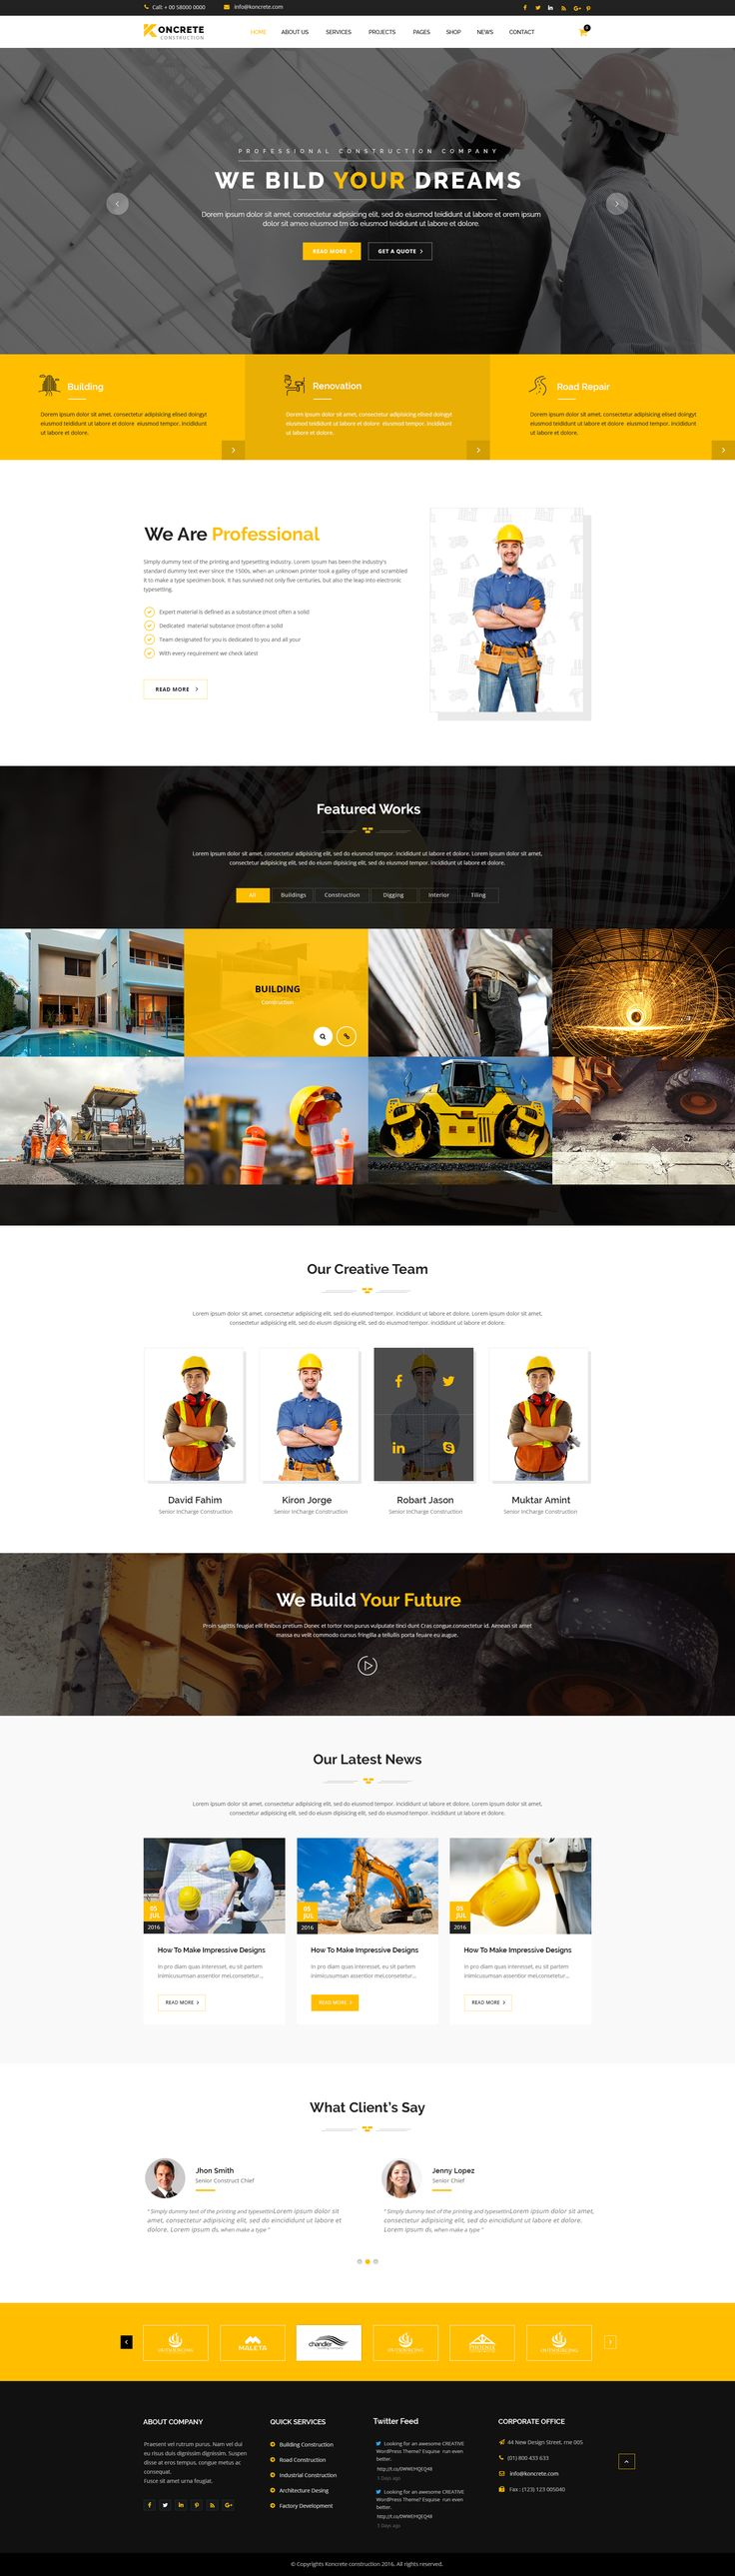 Best 25+ Construction website ideas on Pinterest | Simple web ...